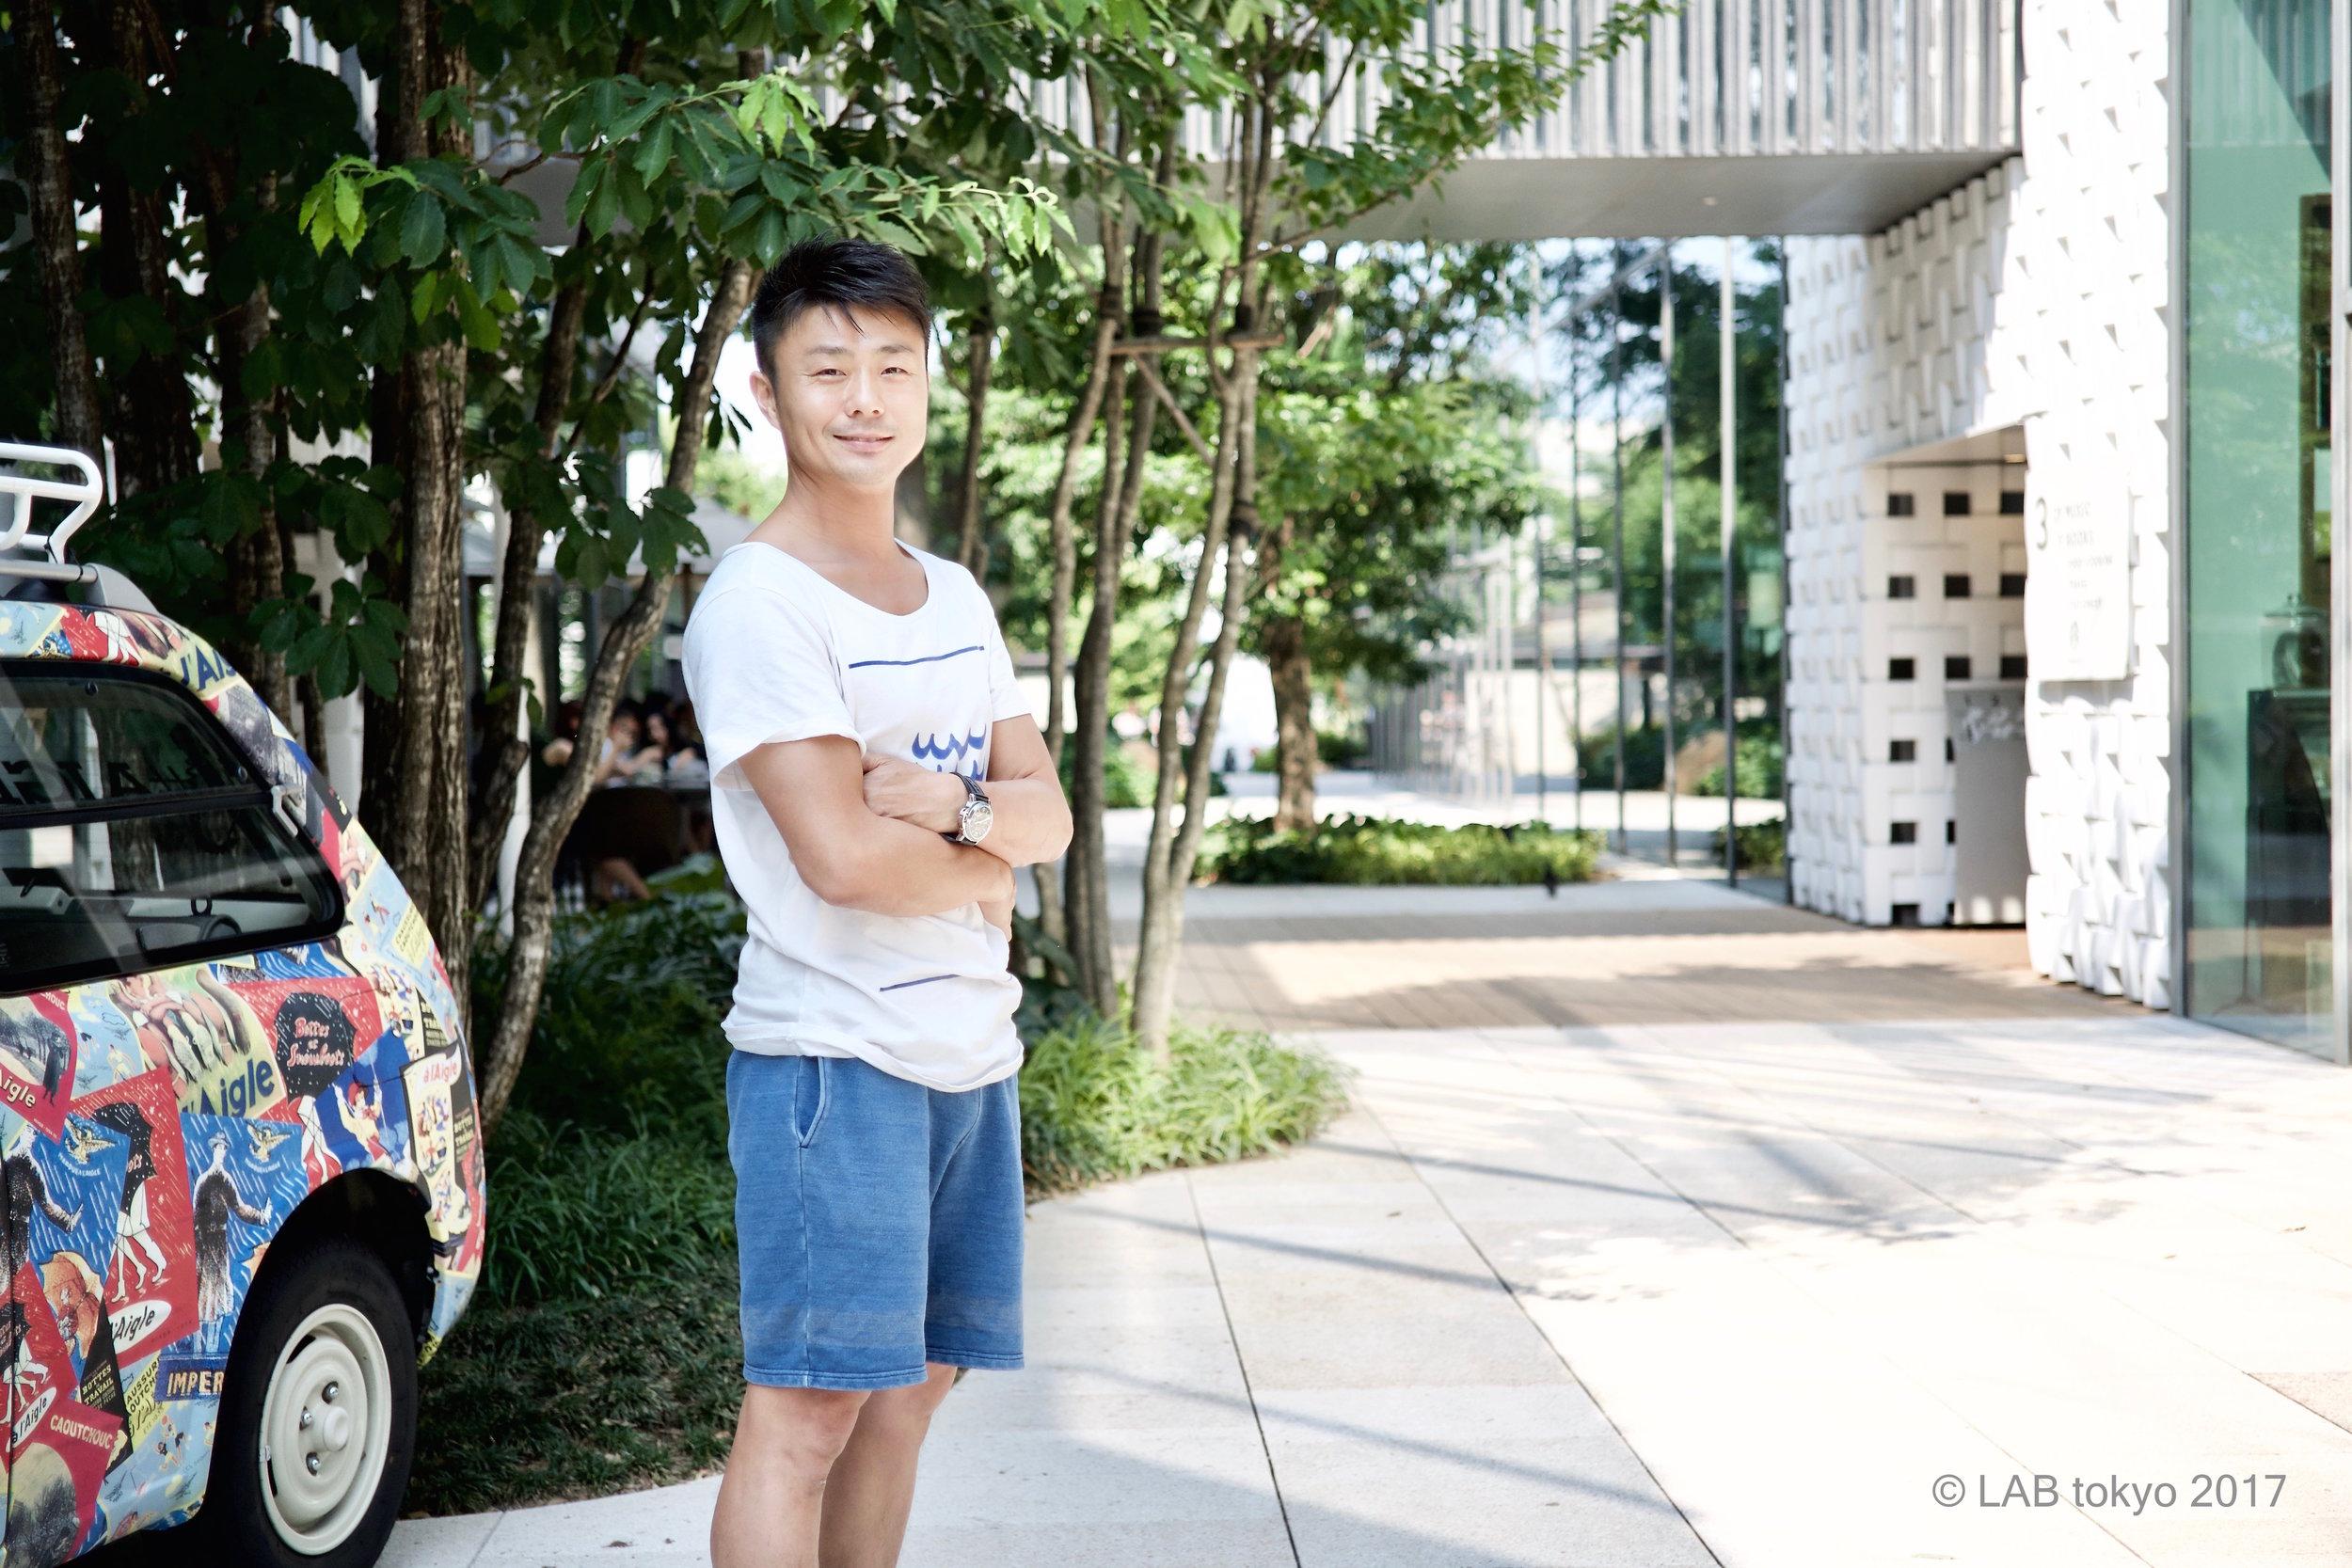 Daisuke Yamada - Professional Photographer